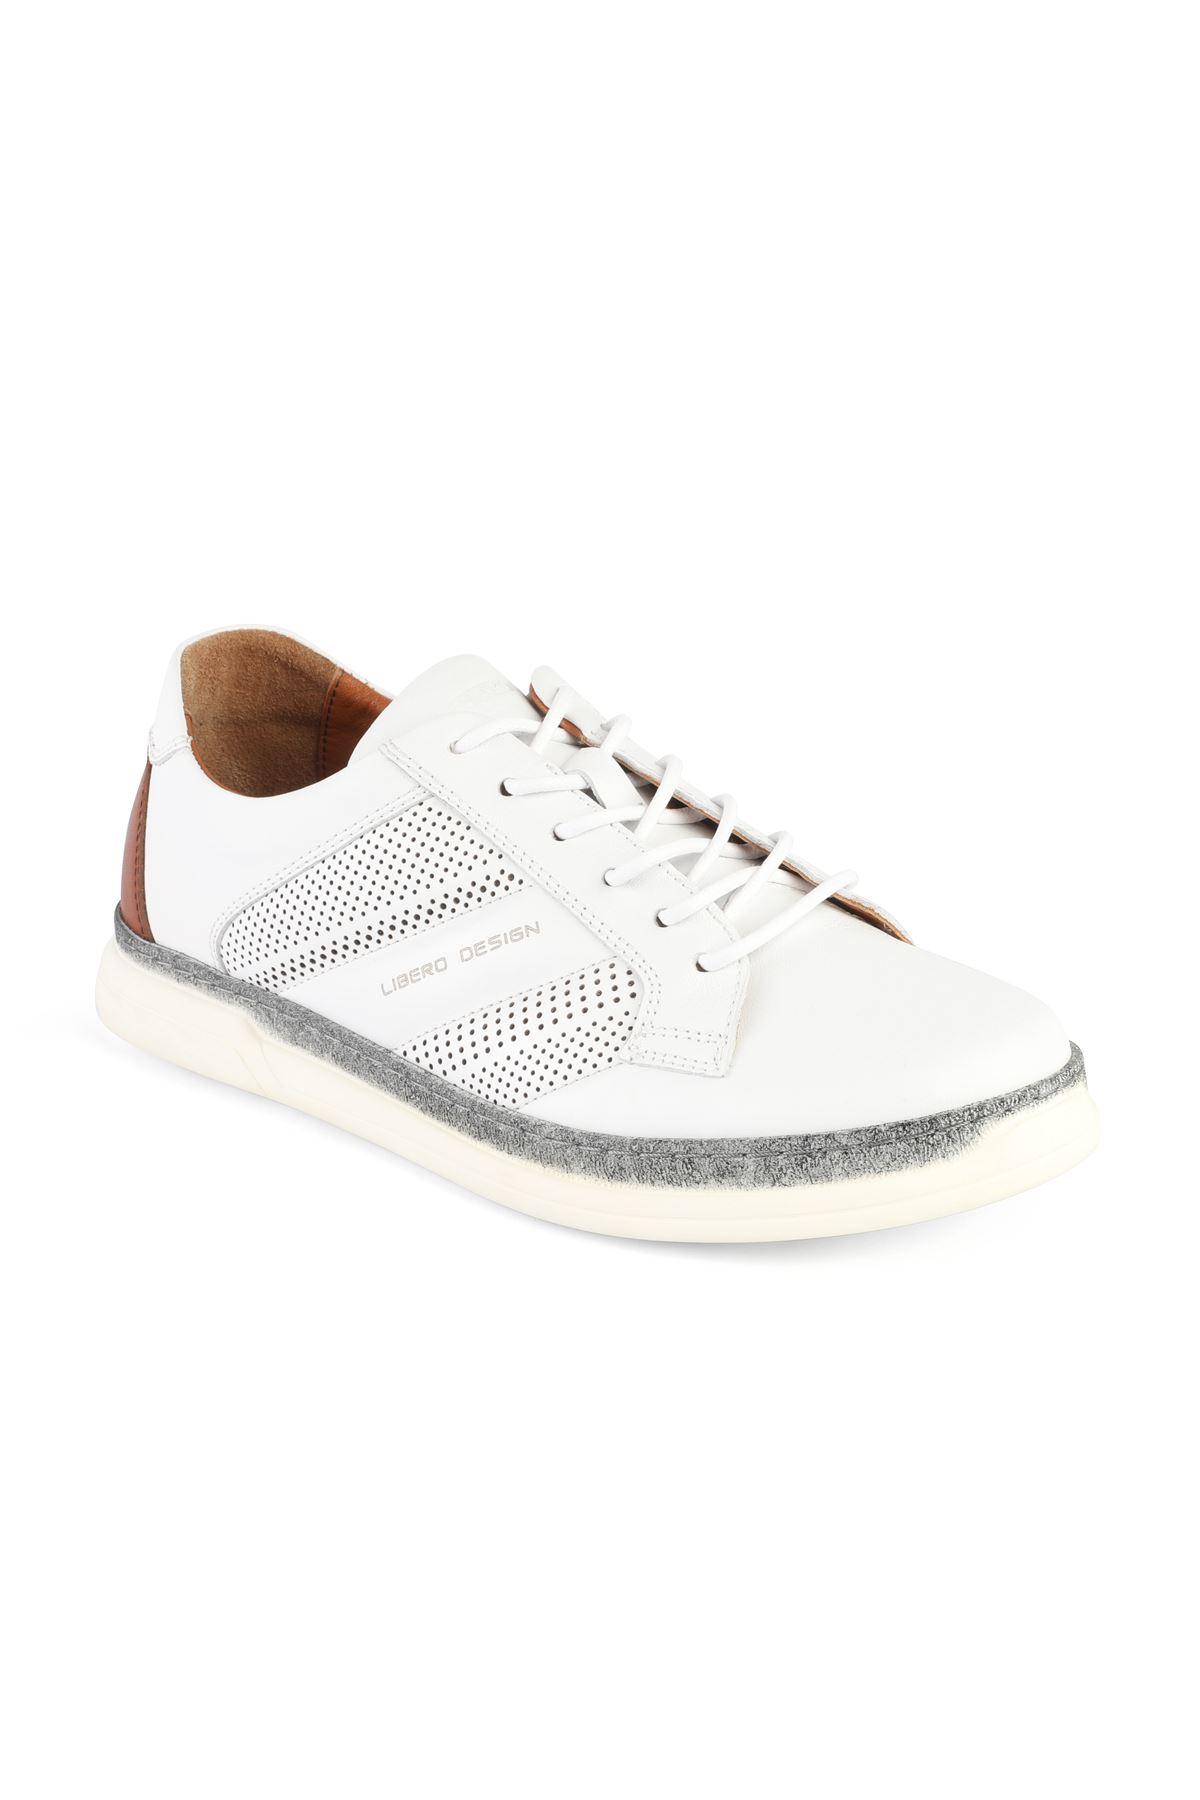 Libero 3308 Beyaz Casual Ayakkabı